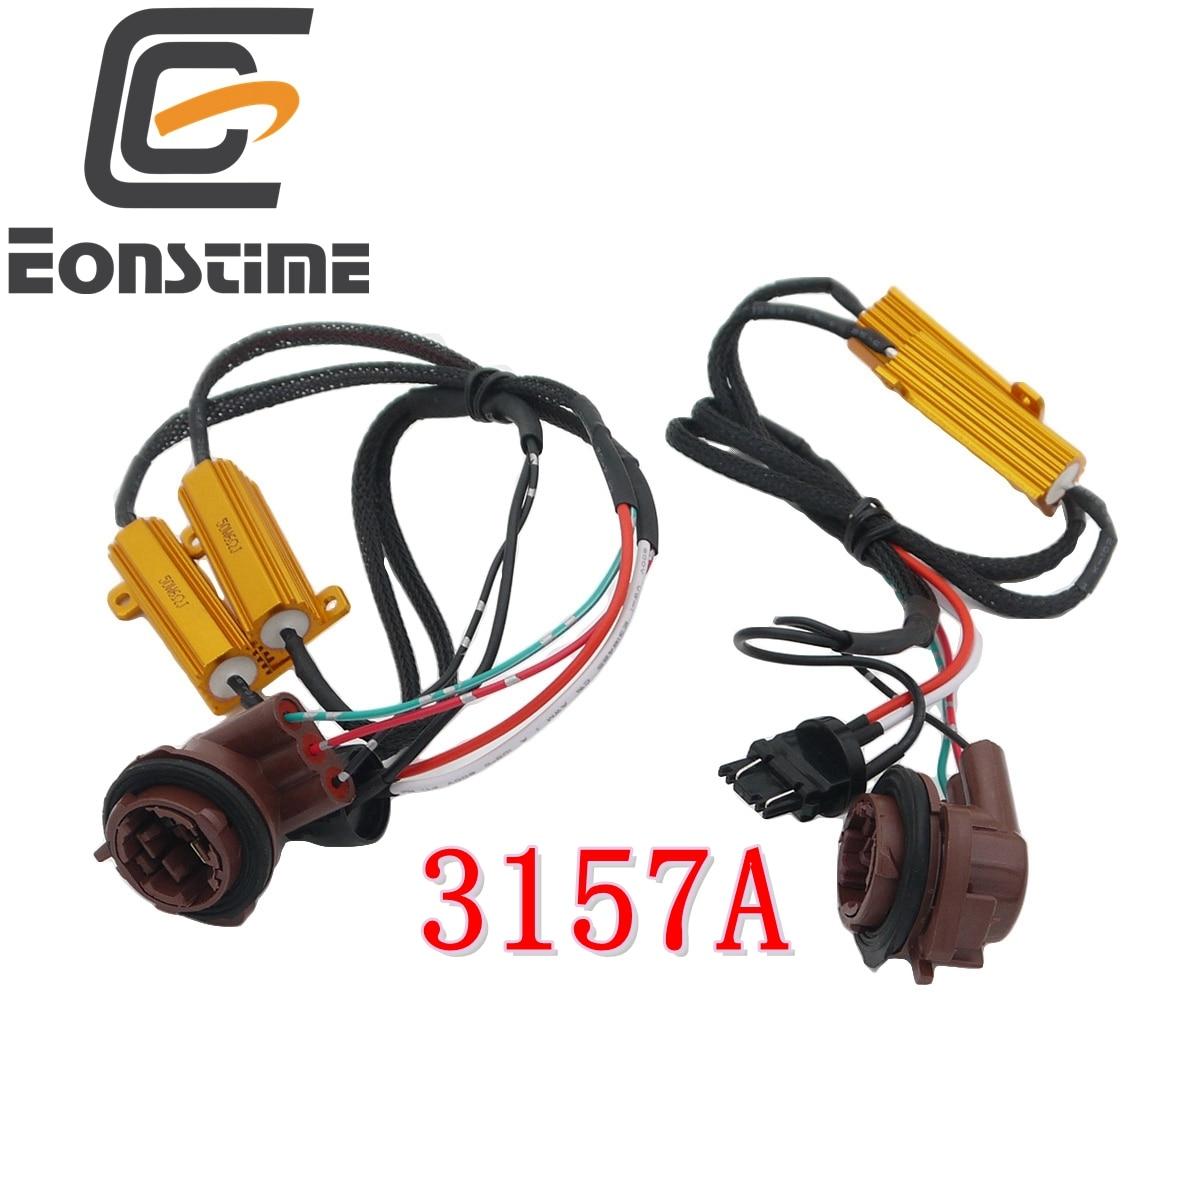 Led Turn Signal Resistor Wiring Diagram 2x Load Resistor 50w 6ohm